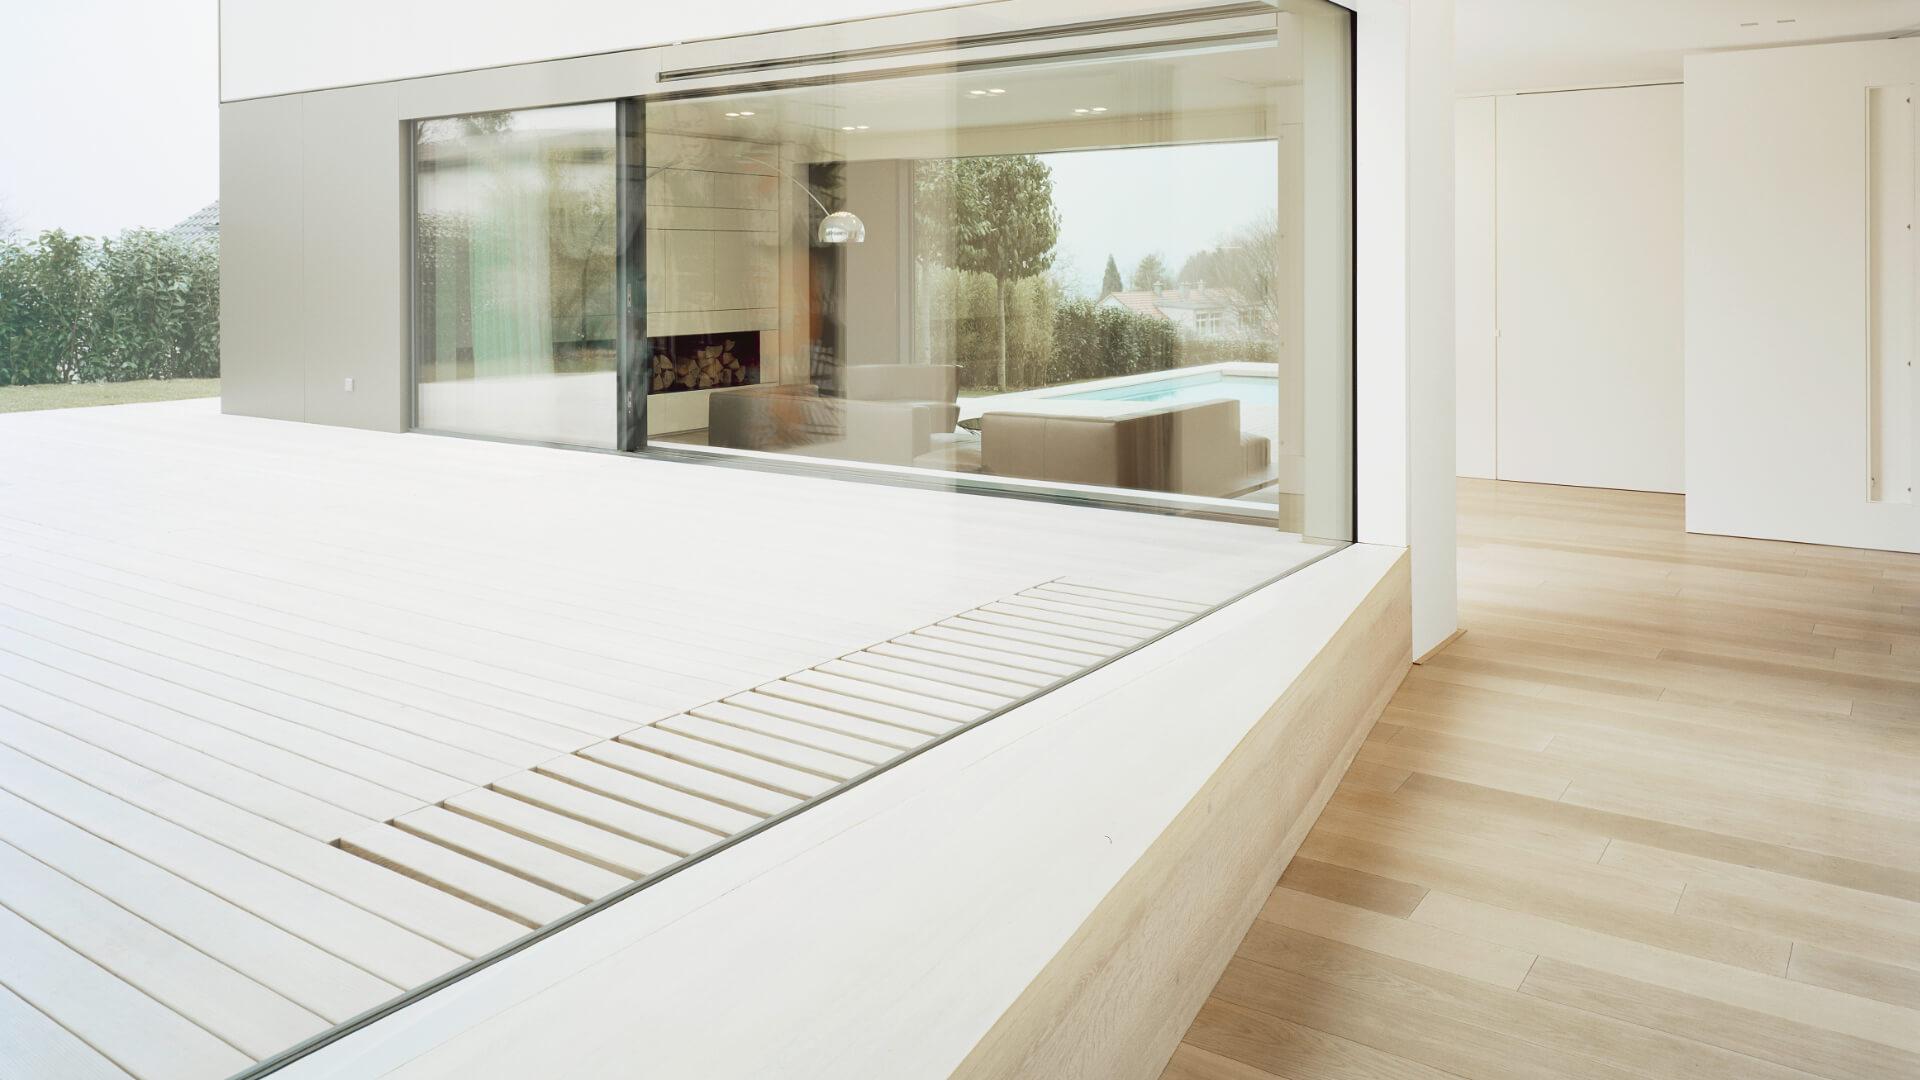 dielenb den douglasie dielen 100er serie pur natur. Black Bedroom Furniture Sets. Home Design Ideas